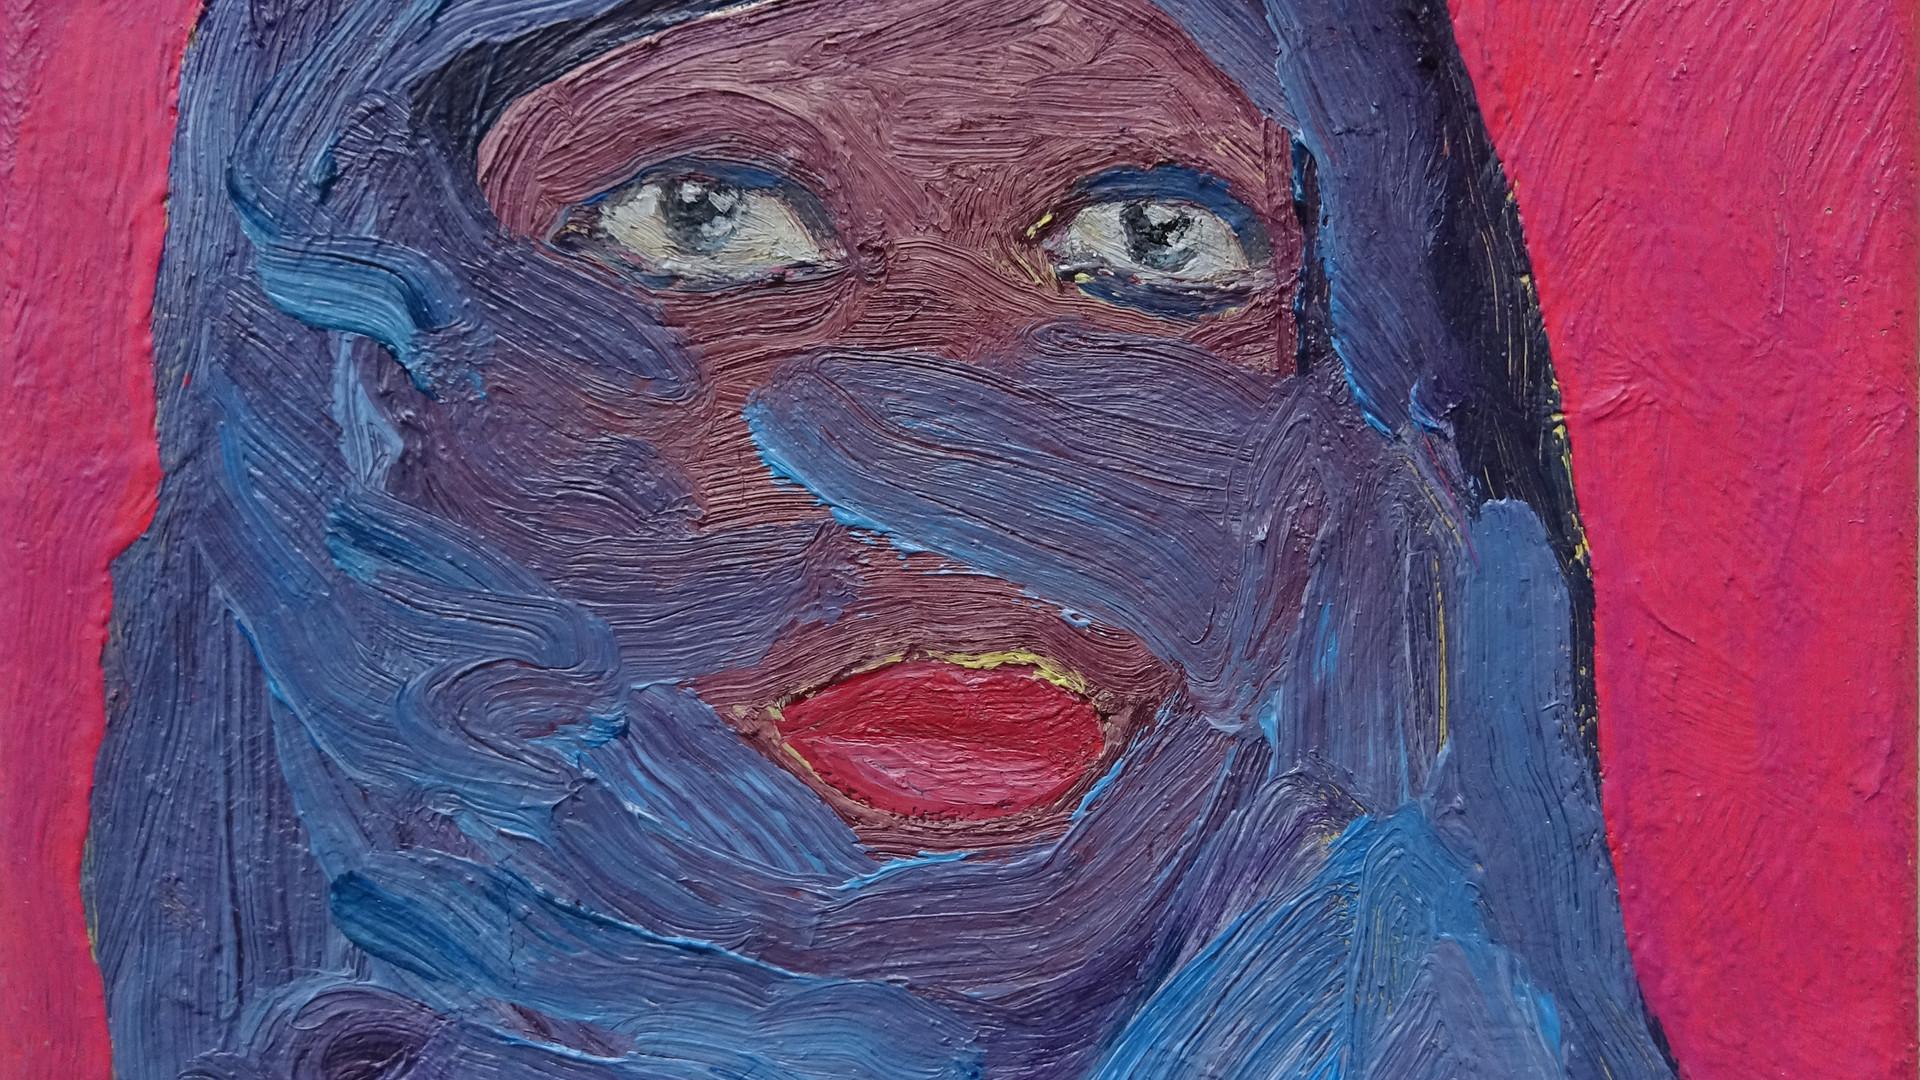 HRoberts 'Demure', oil on Canvas, 20x20c